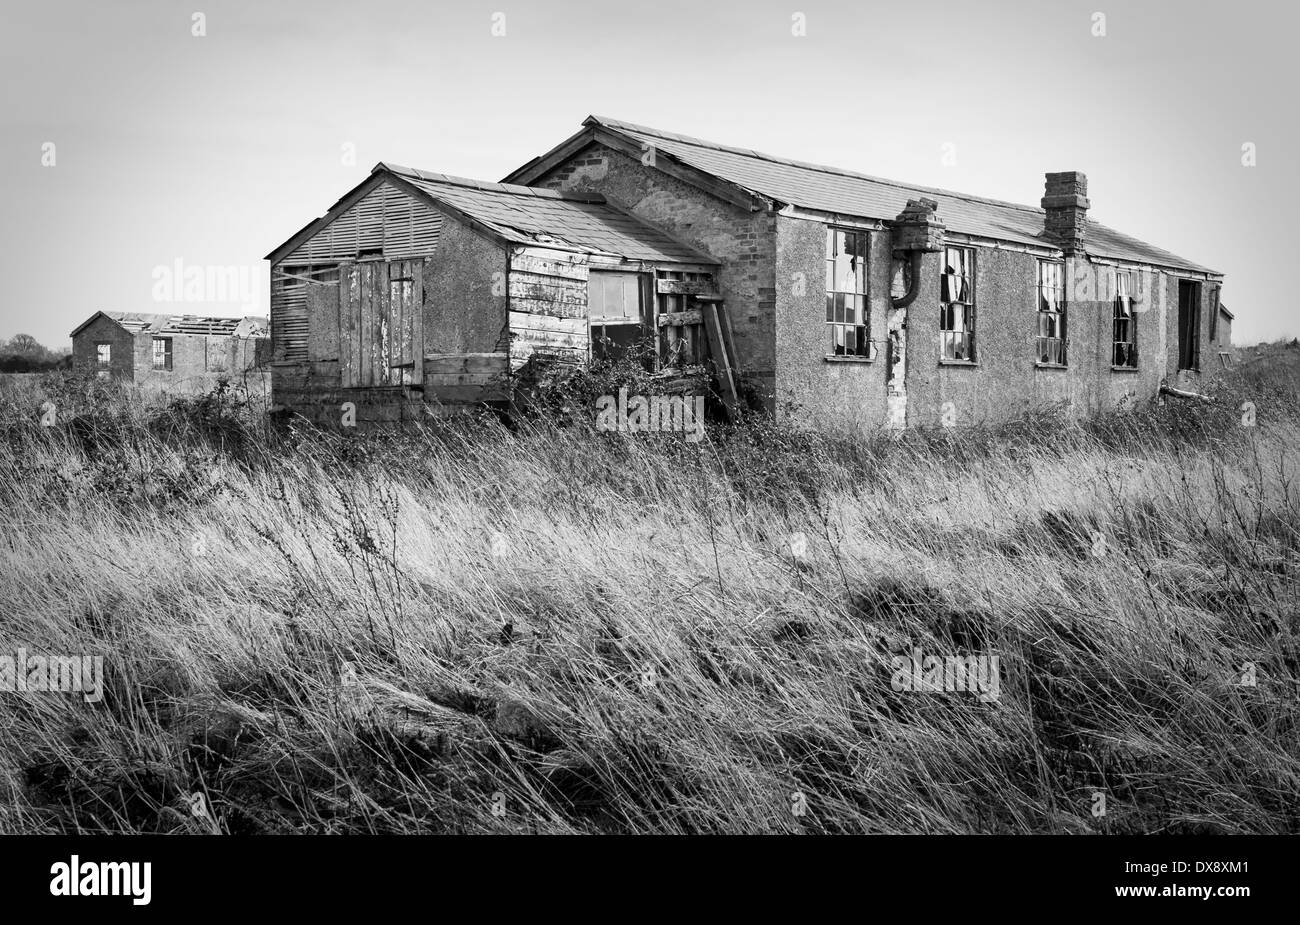 derelict building at Stow Maries aerodrome - Stock Image